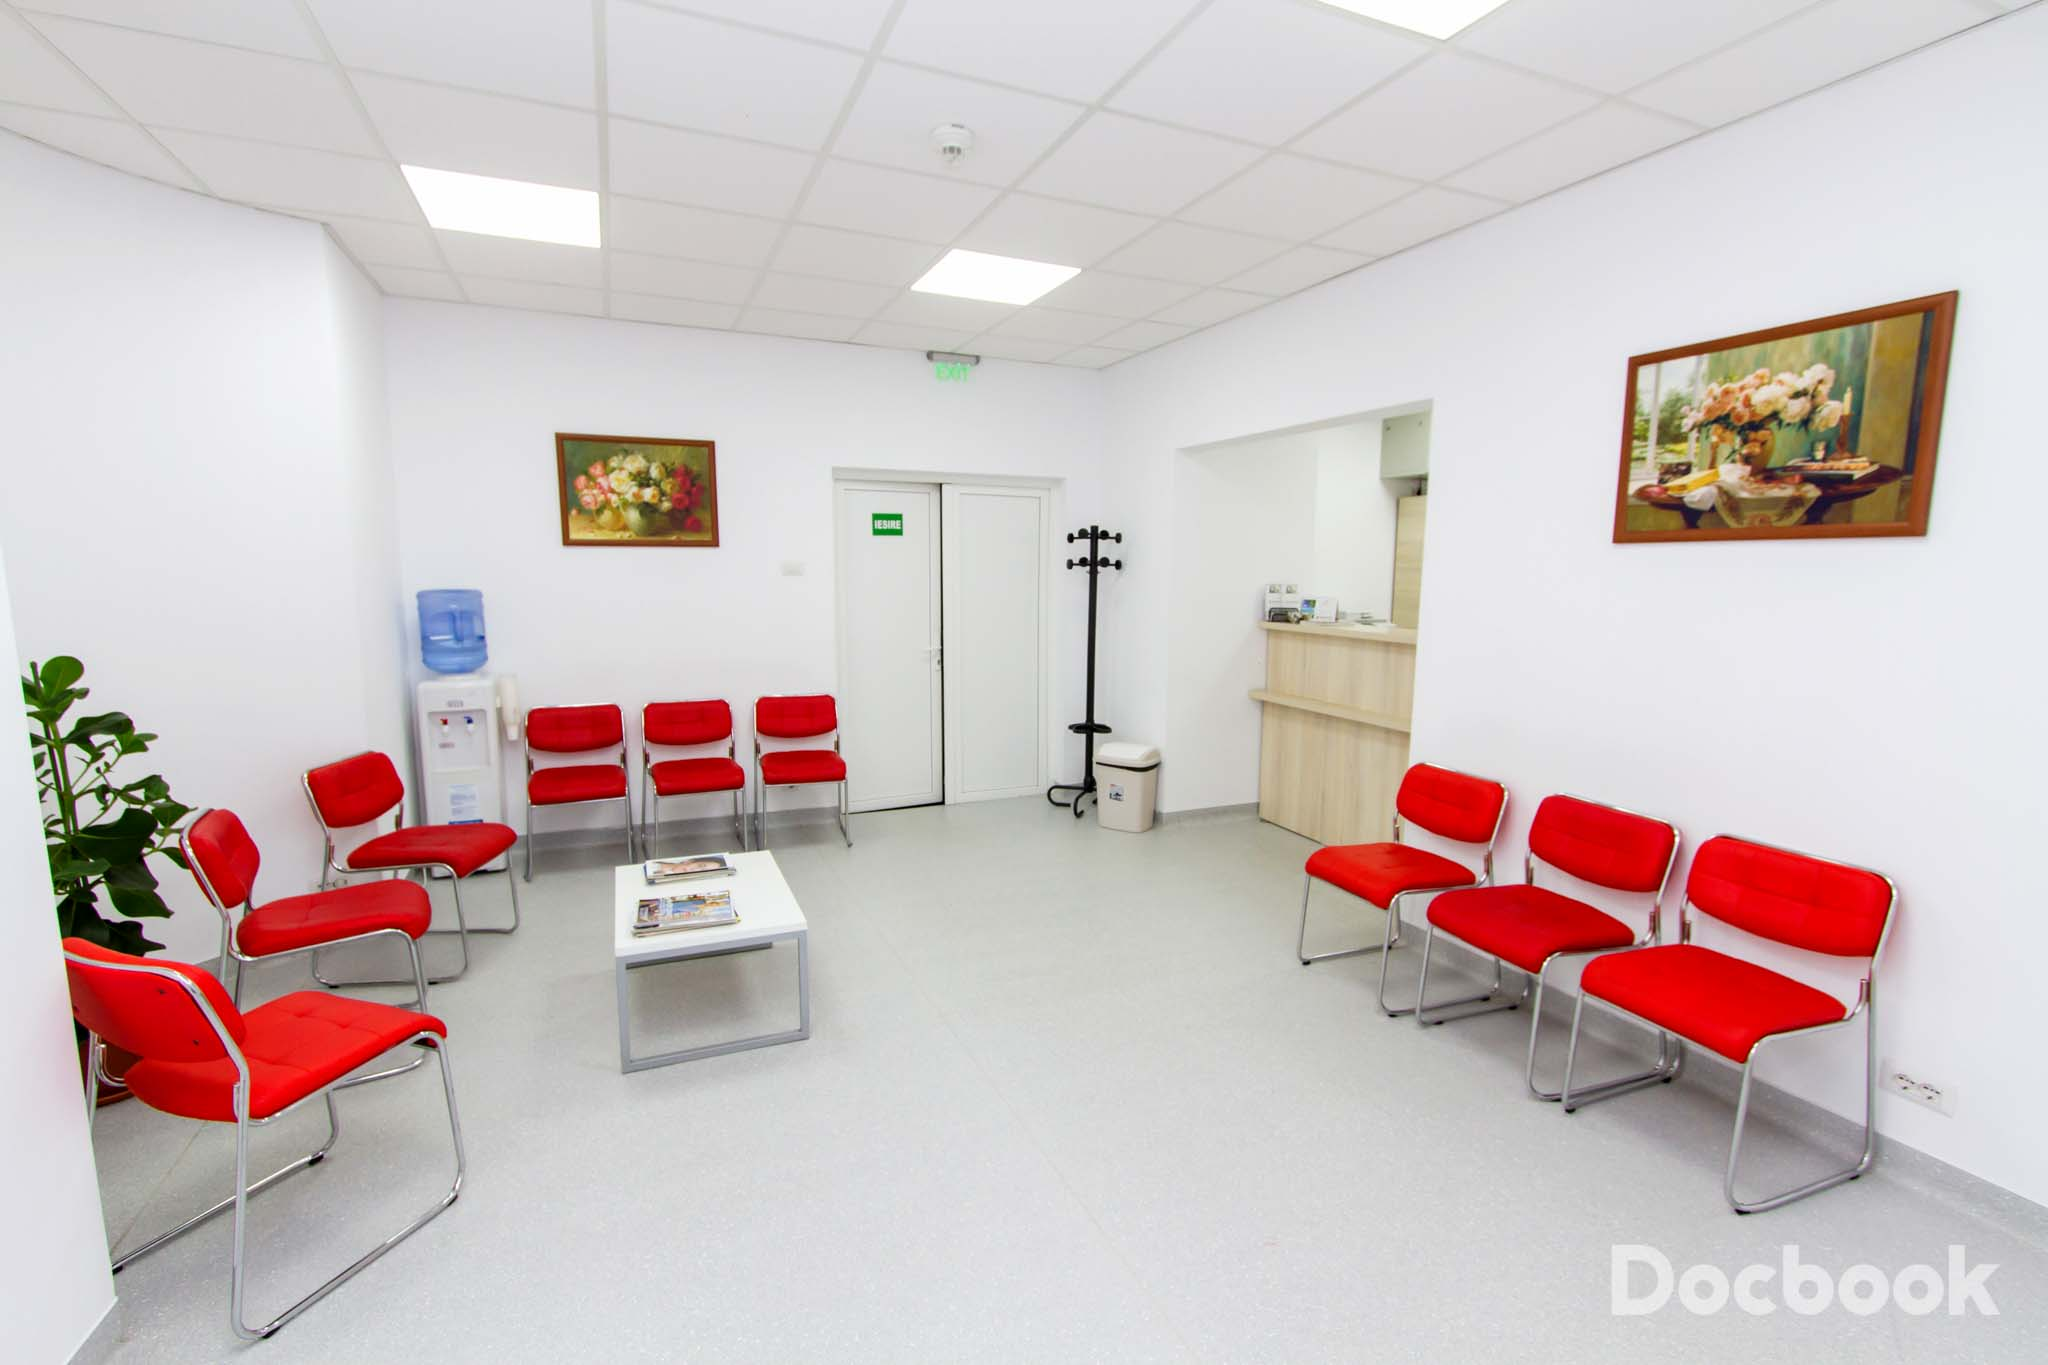 Clinica Medicales Burghele 2 RMN